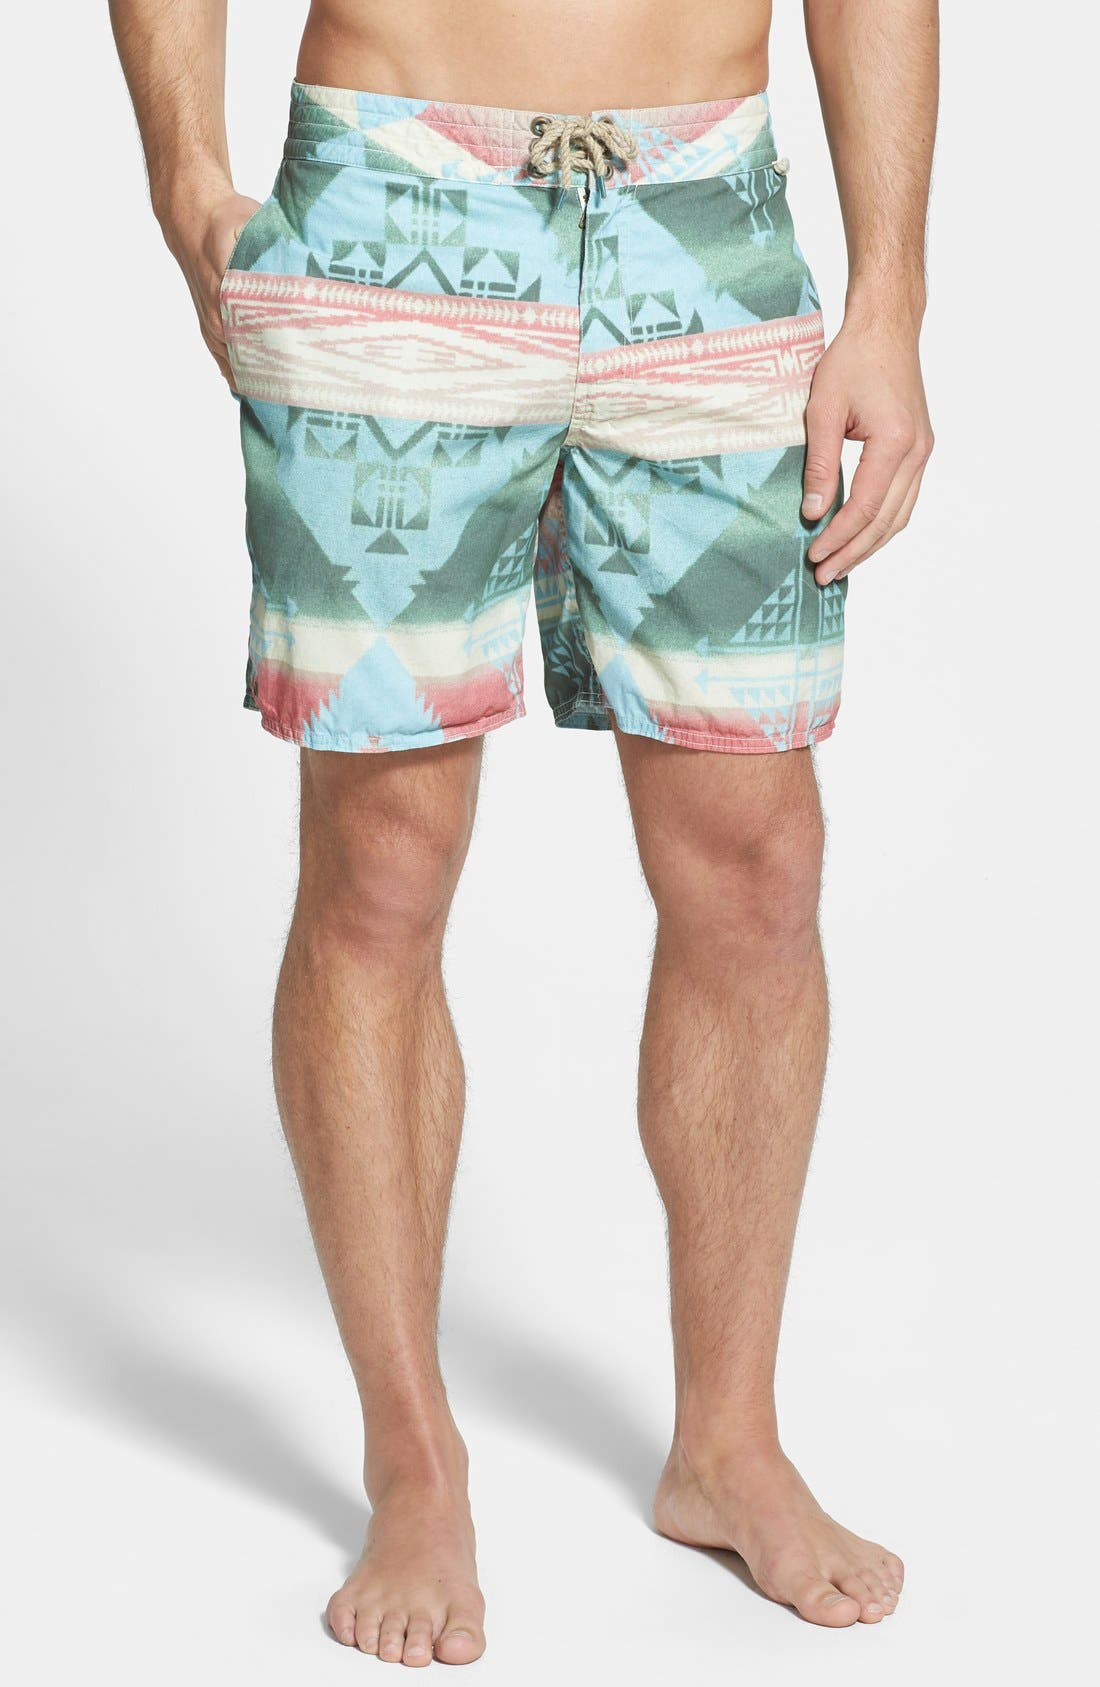 Alternate Image 1 Selected - Polo Ralph Lauren 'Palm Island' Swim Trunks